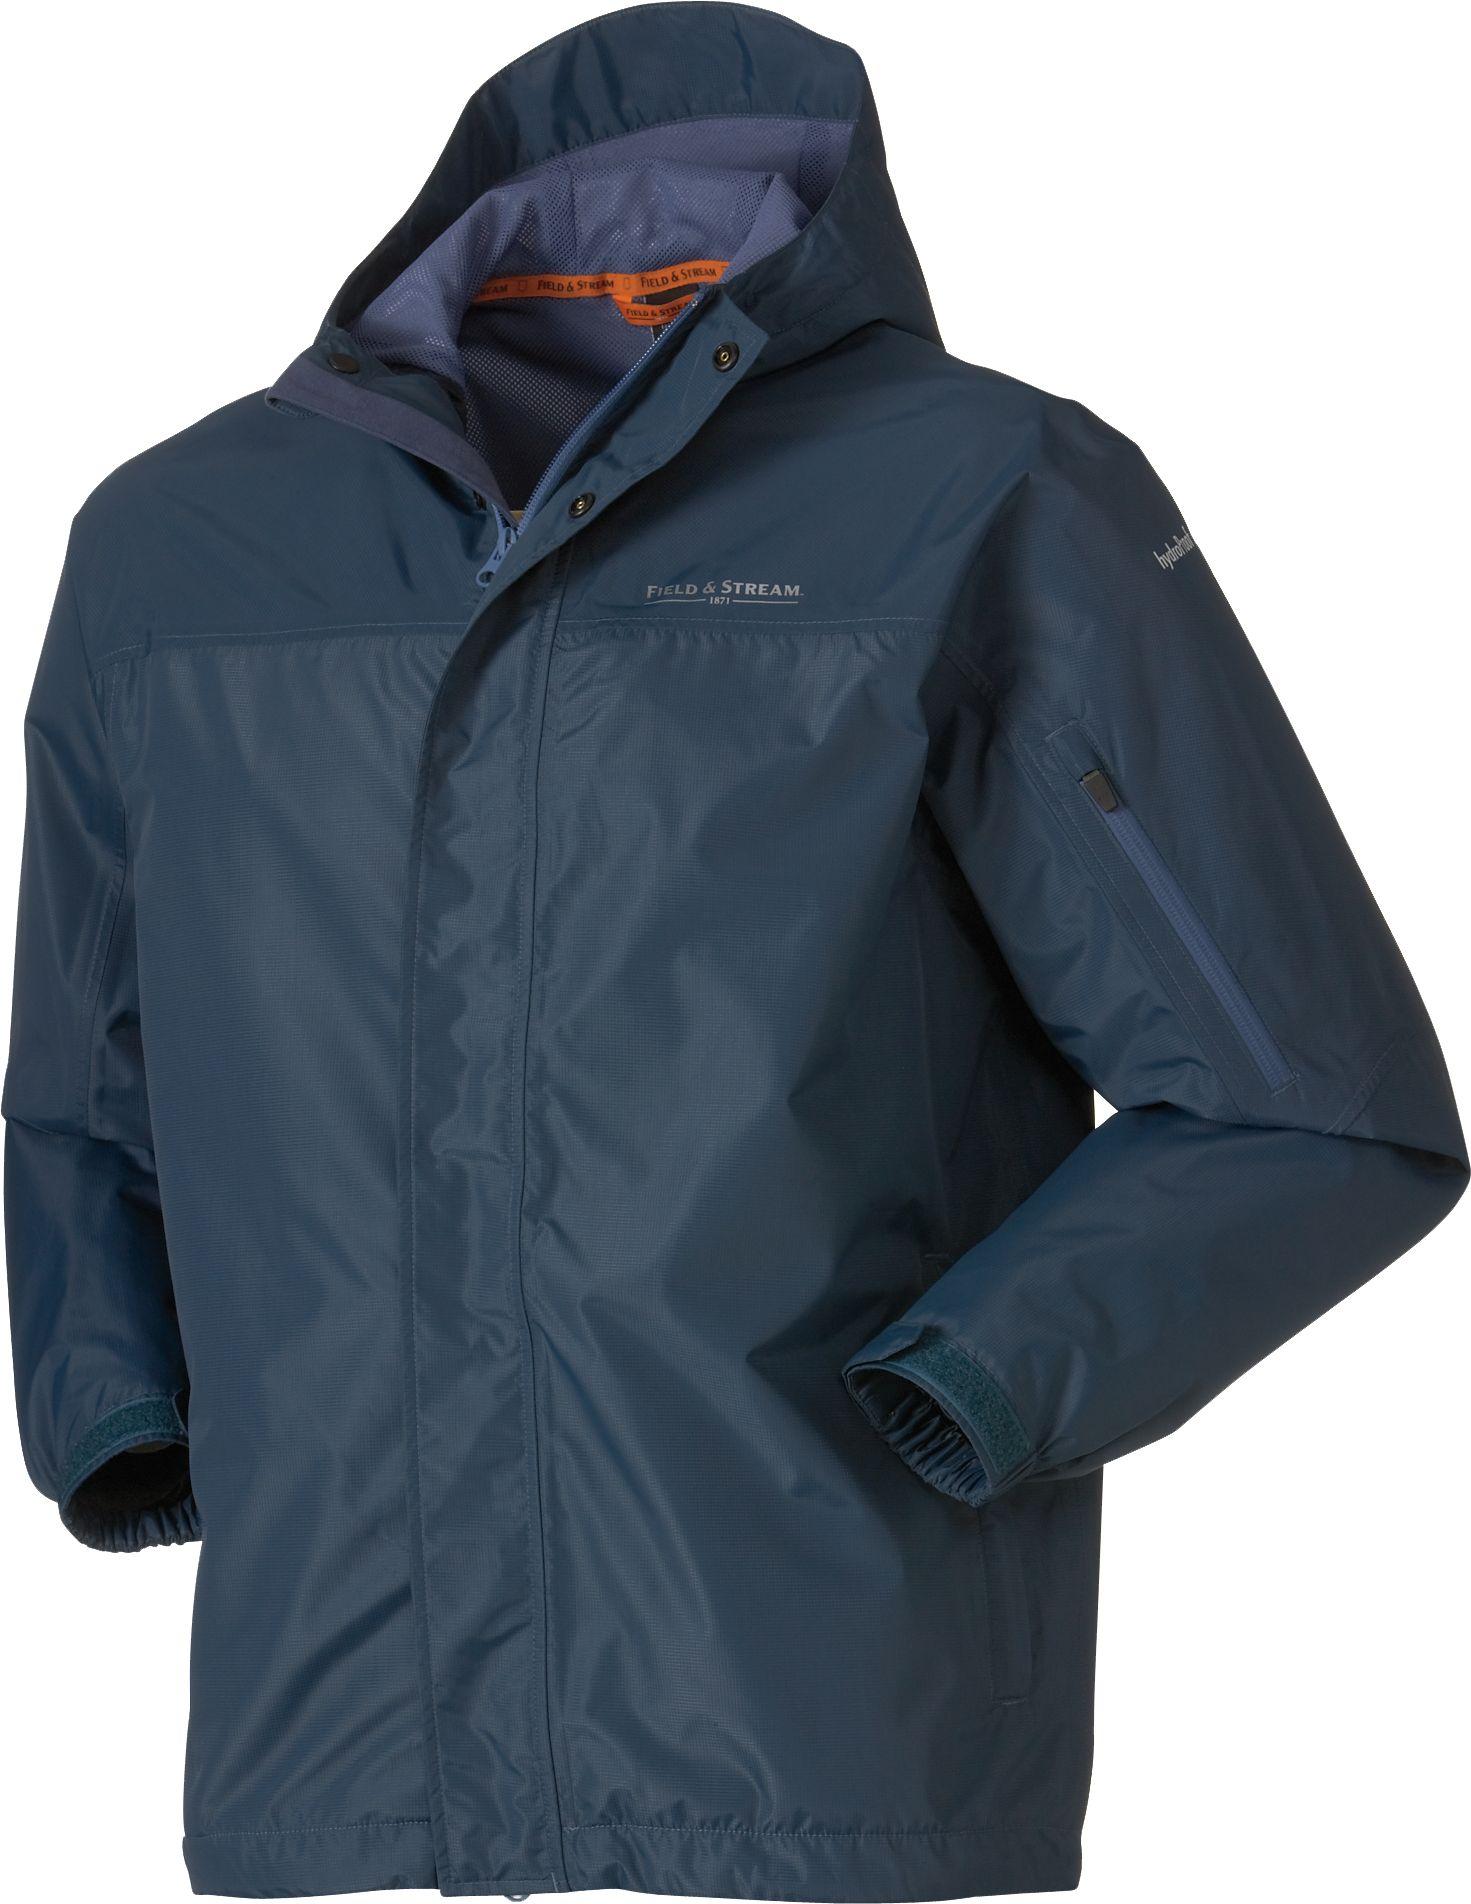 Field & Stream Men's Squall Defender Rain Jacket | DICK'S Sporting ...